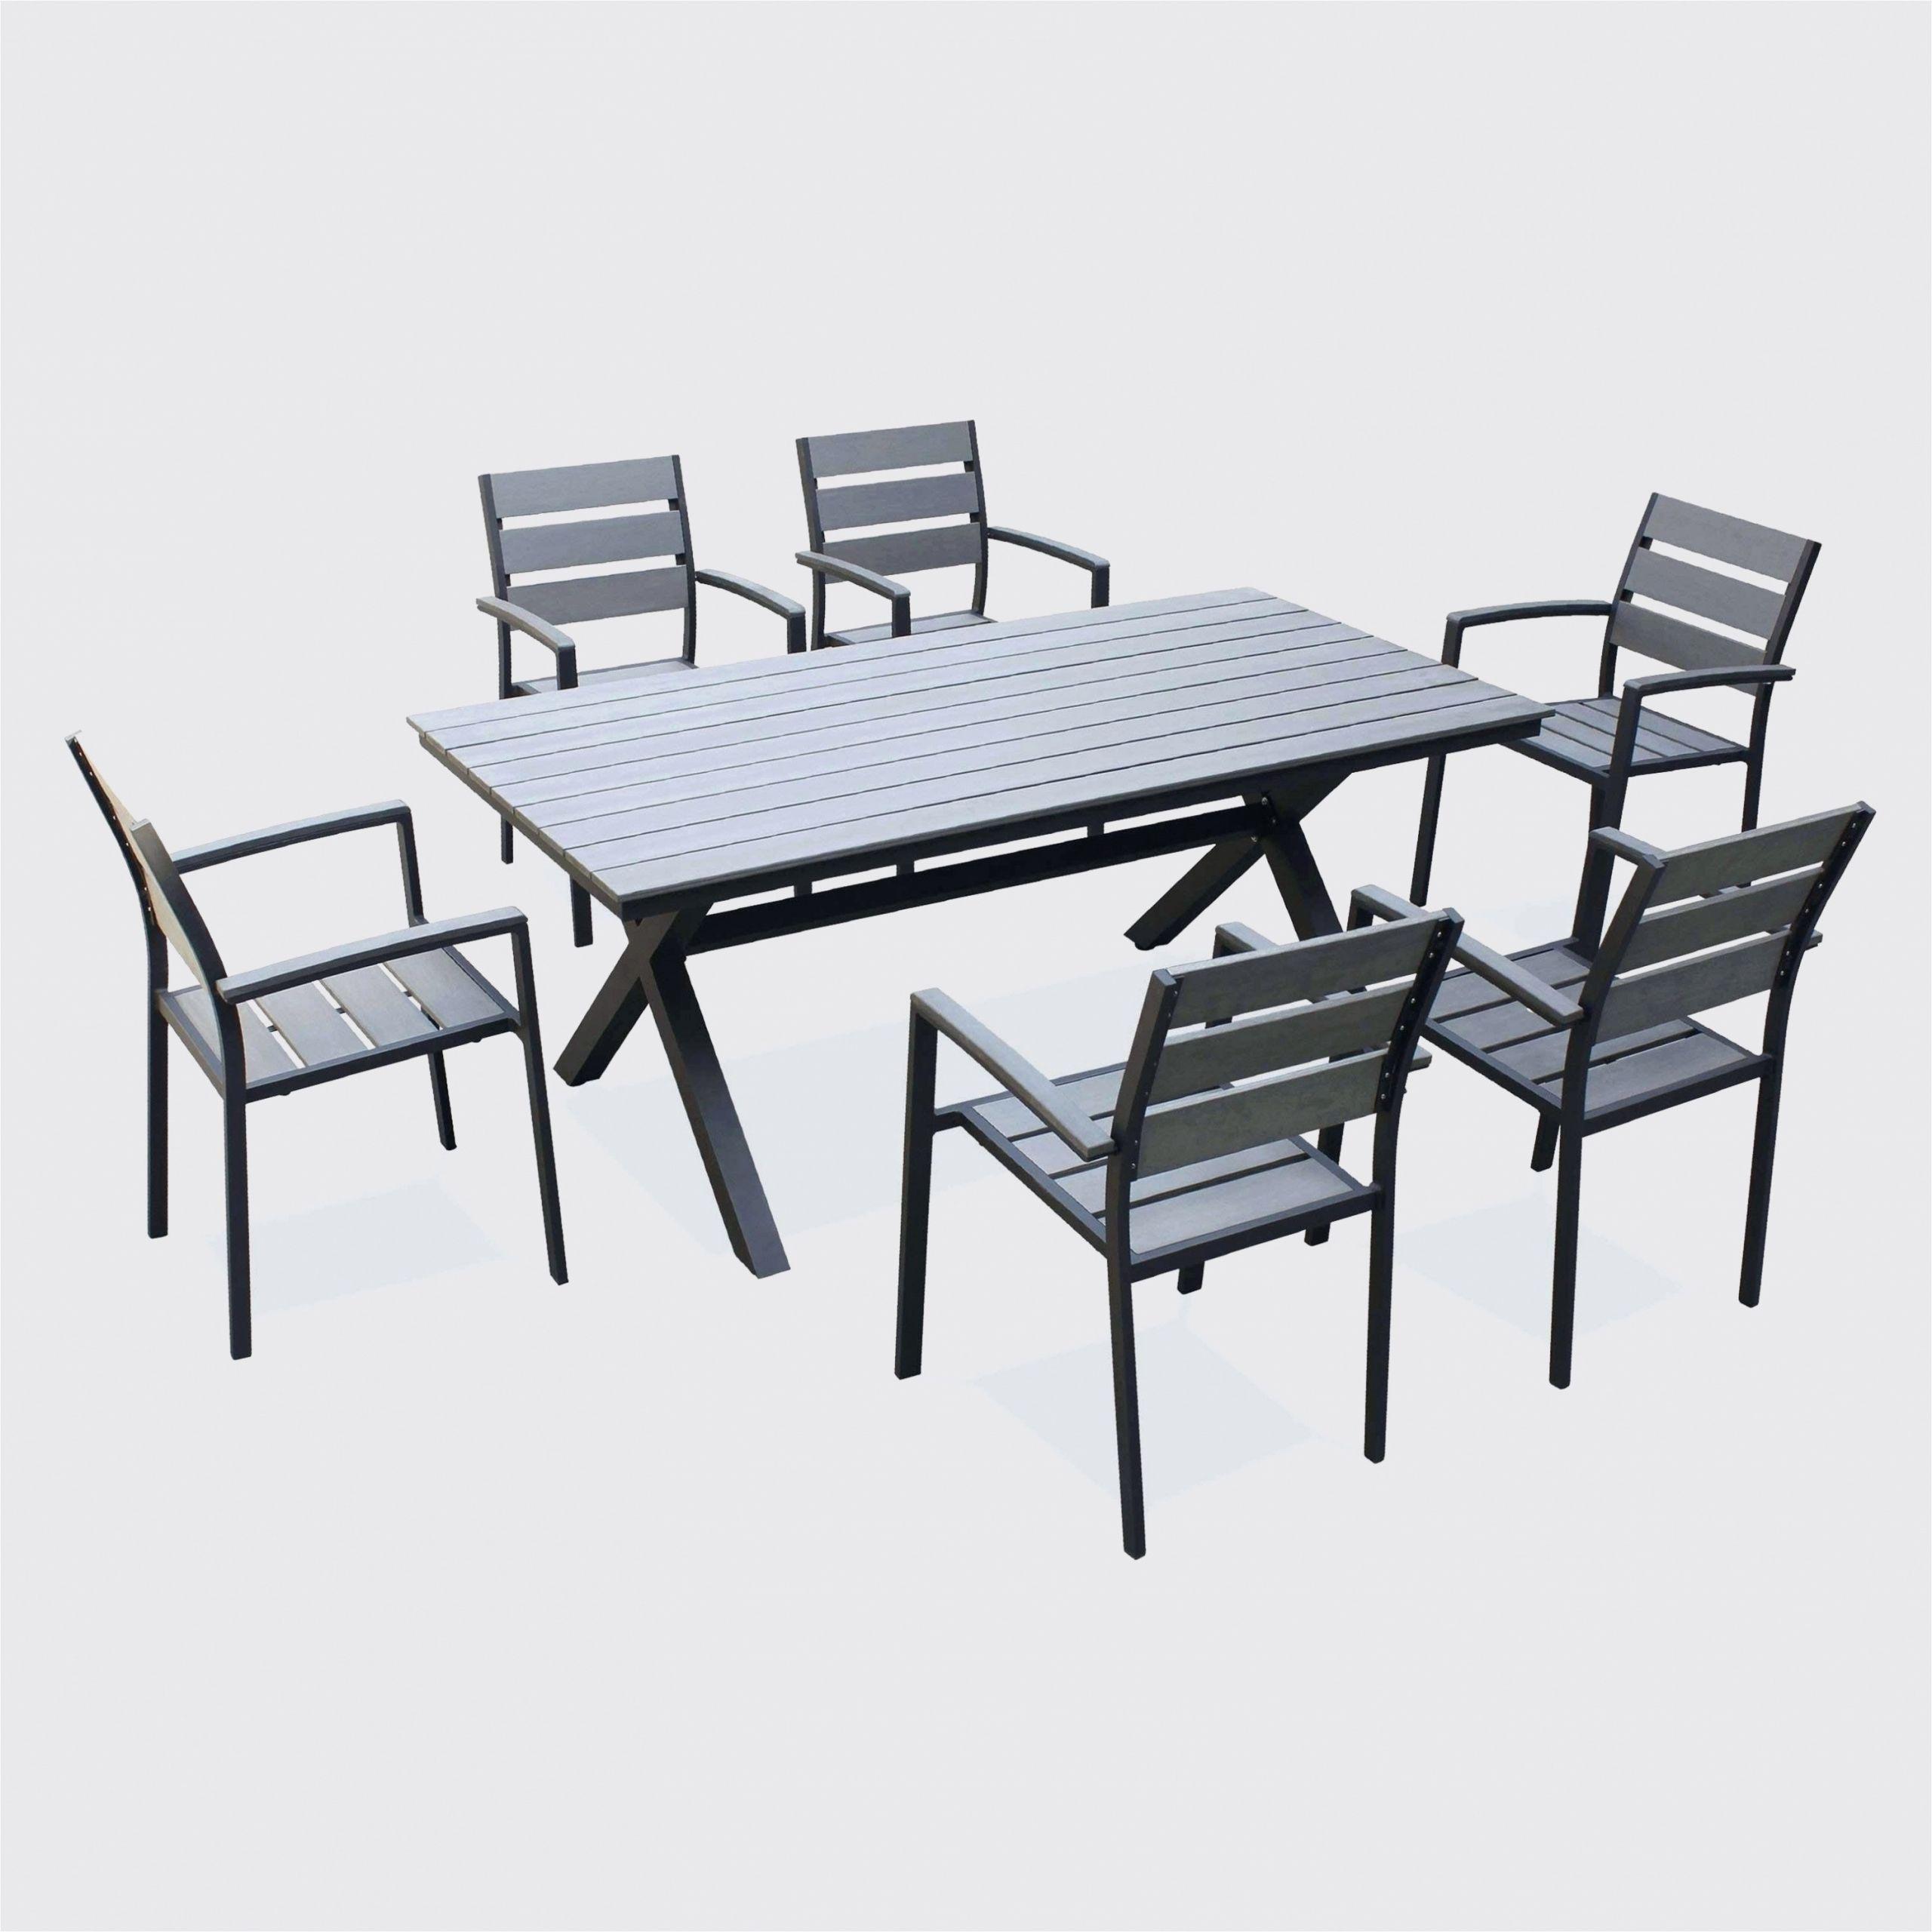 table de jardin avec chaise pas cher inicio puertas de jardin bogotaeslacumbre of table de jardin avec chaise pas cher